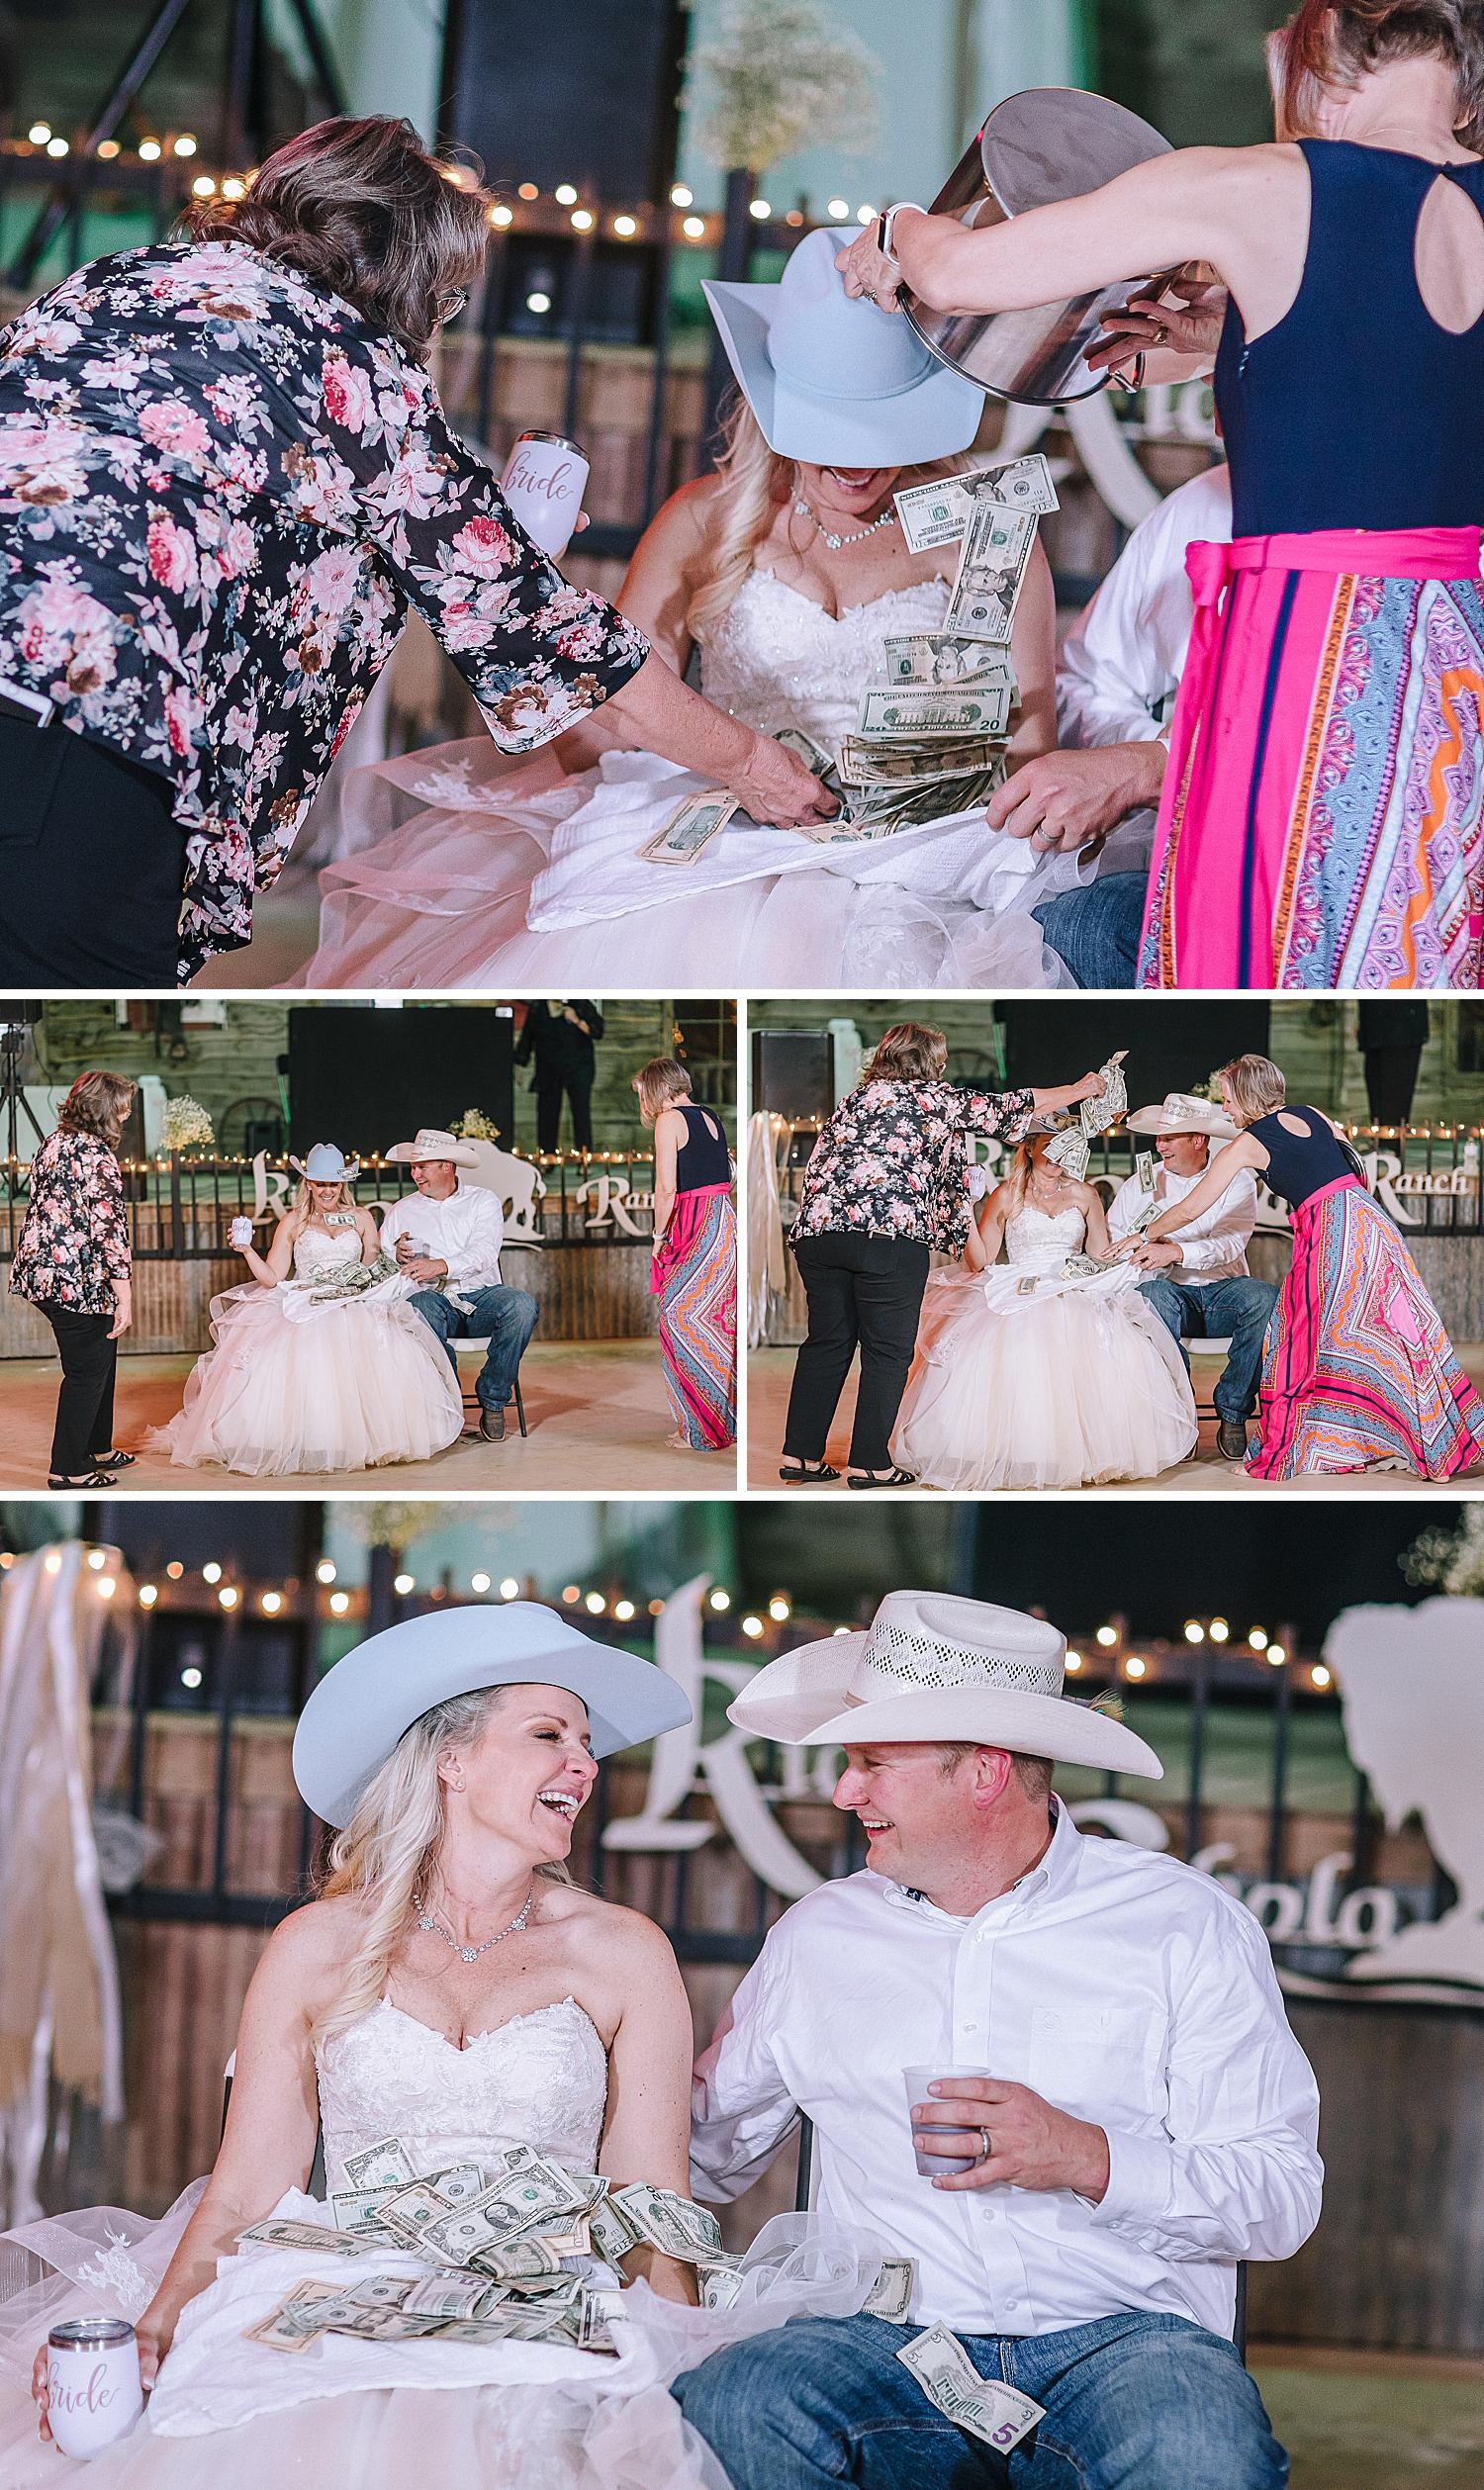 Rio-Cibilo-Ranch-Marion-Texas-Wedding-Rustic-Blush-Rose-Quartz-Details-Carly-Barton-Photography_0101.jpg